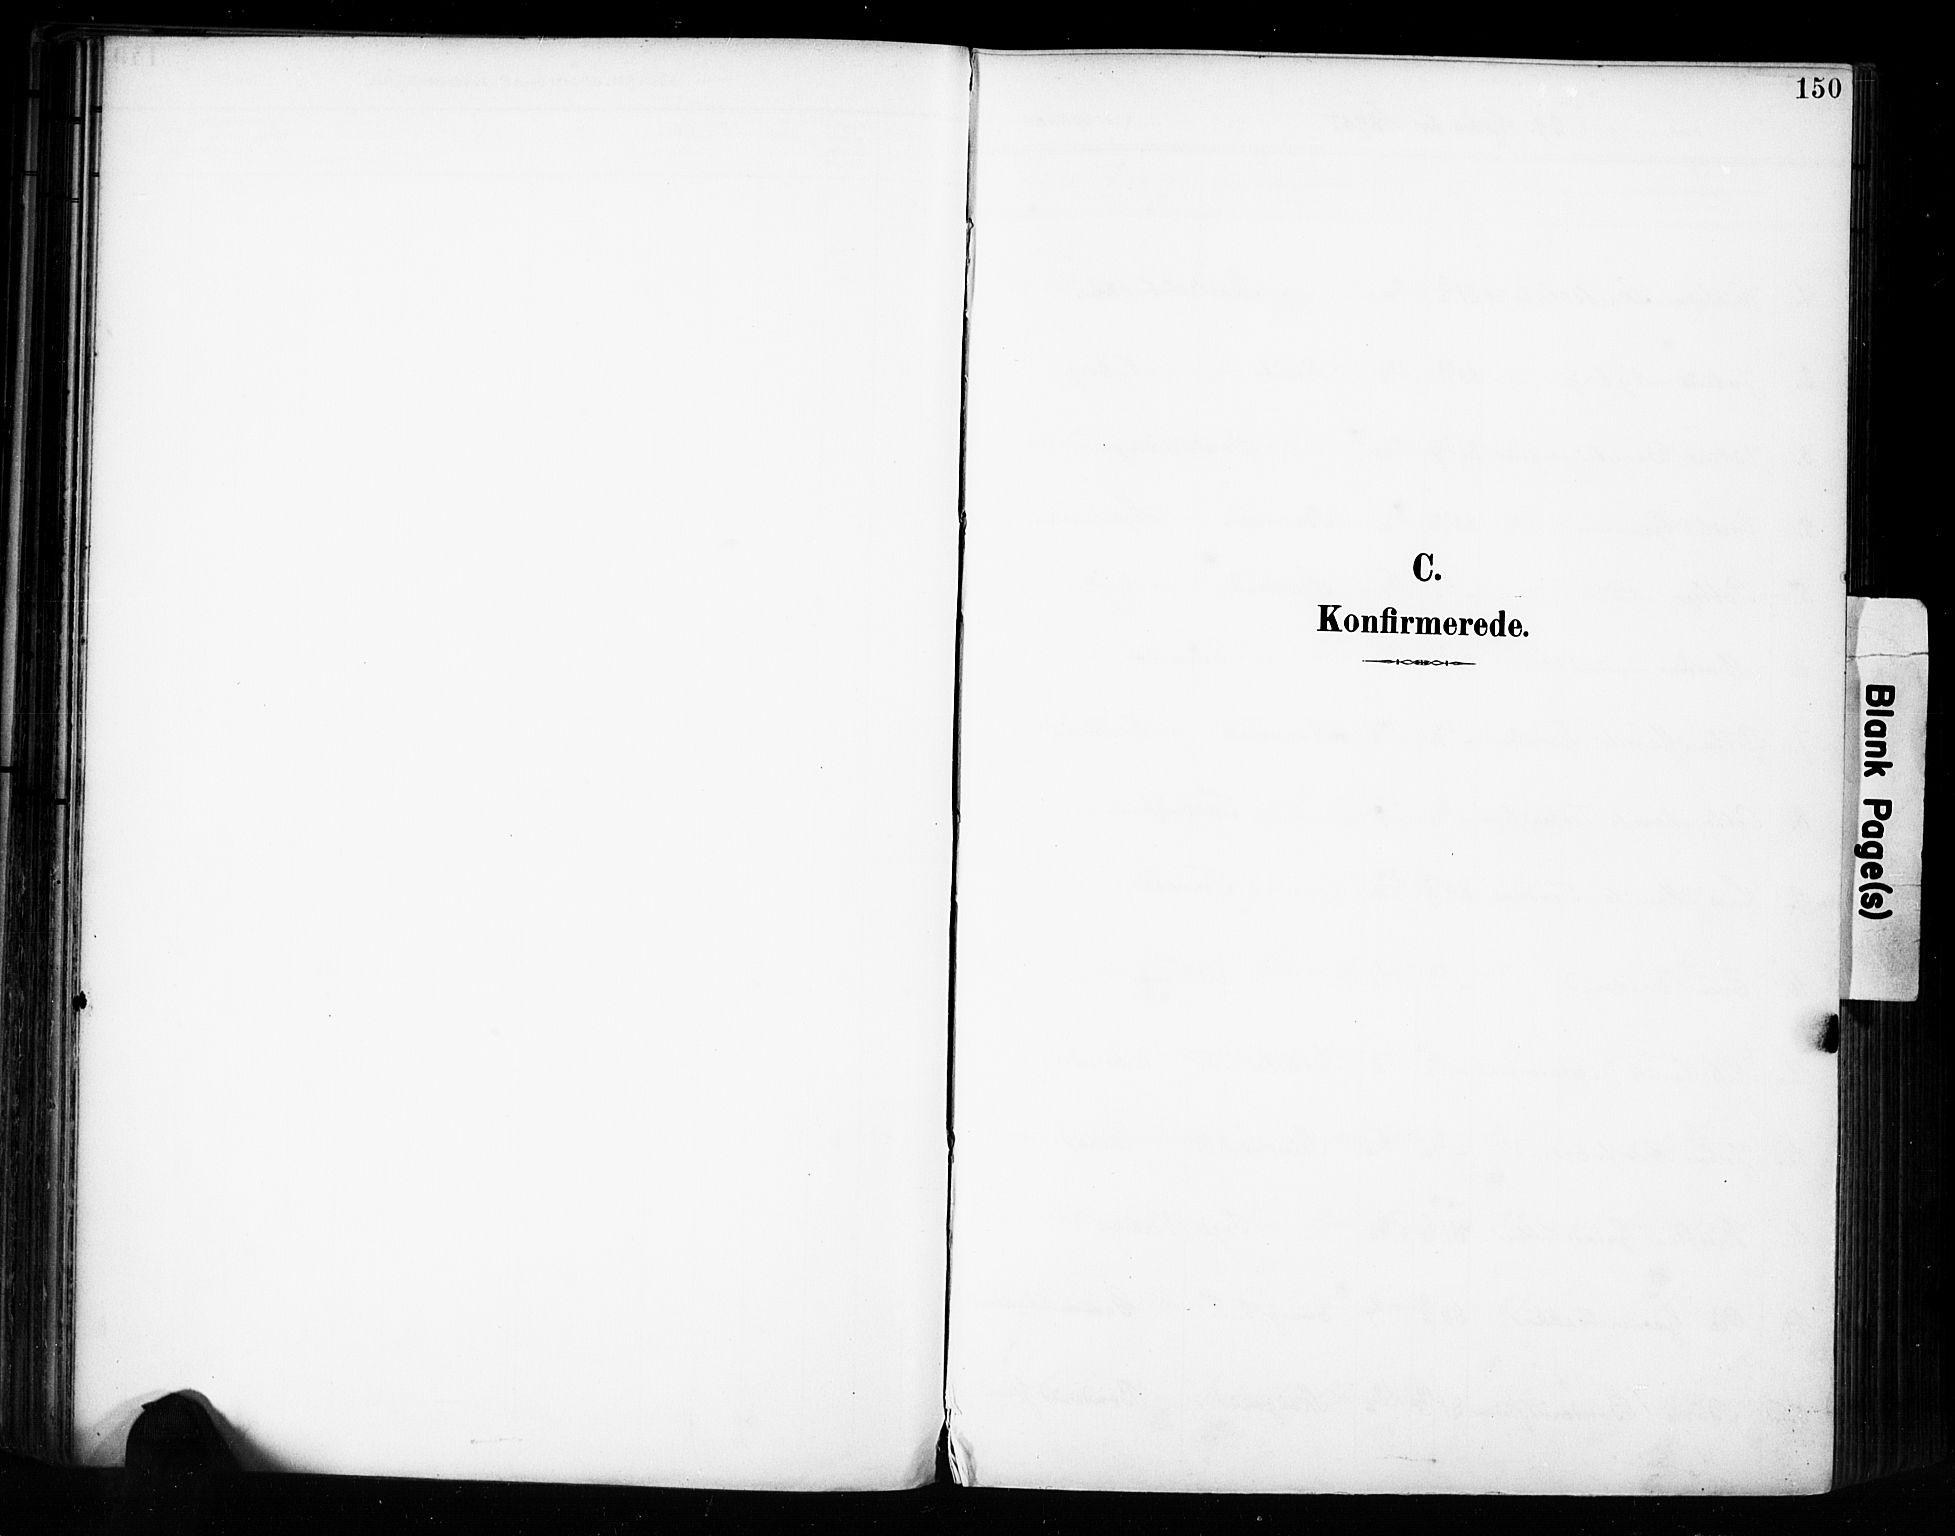 SAH, Vestre Toten prestekontor, H/Ha/Haa/L0011: Ministerialbok nr. 11, 1895-1906, s. 150